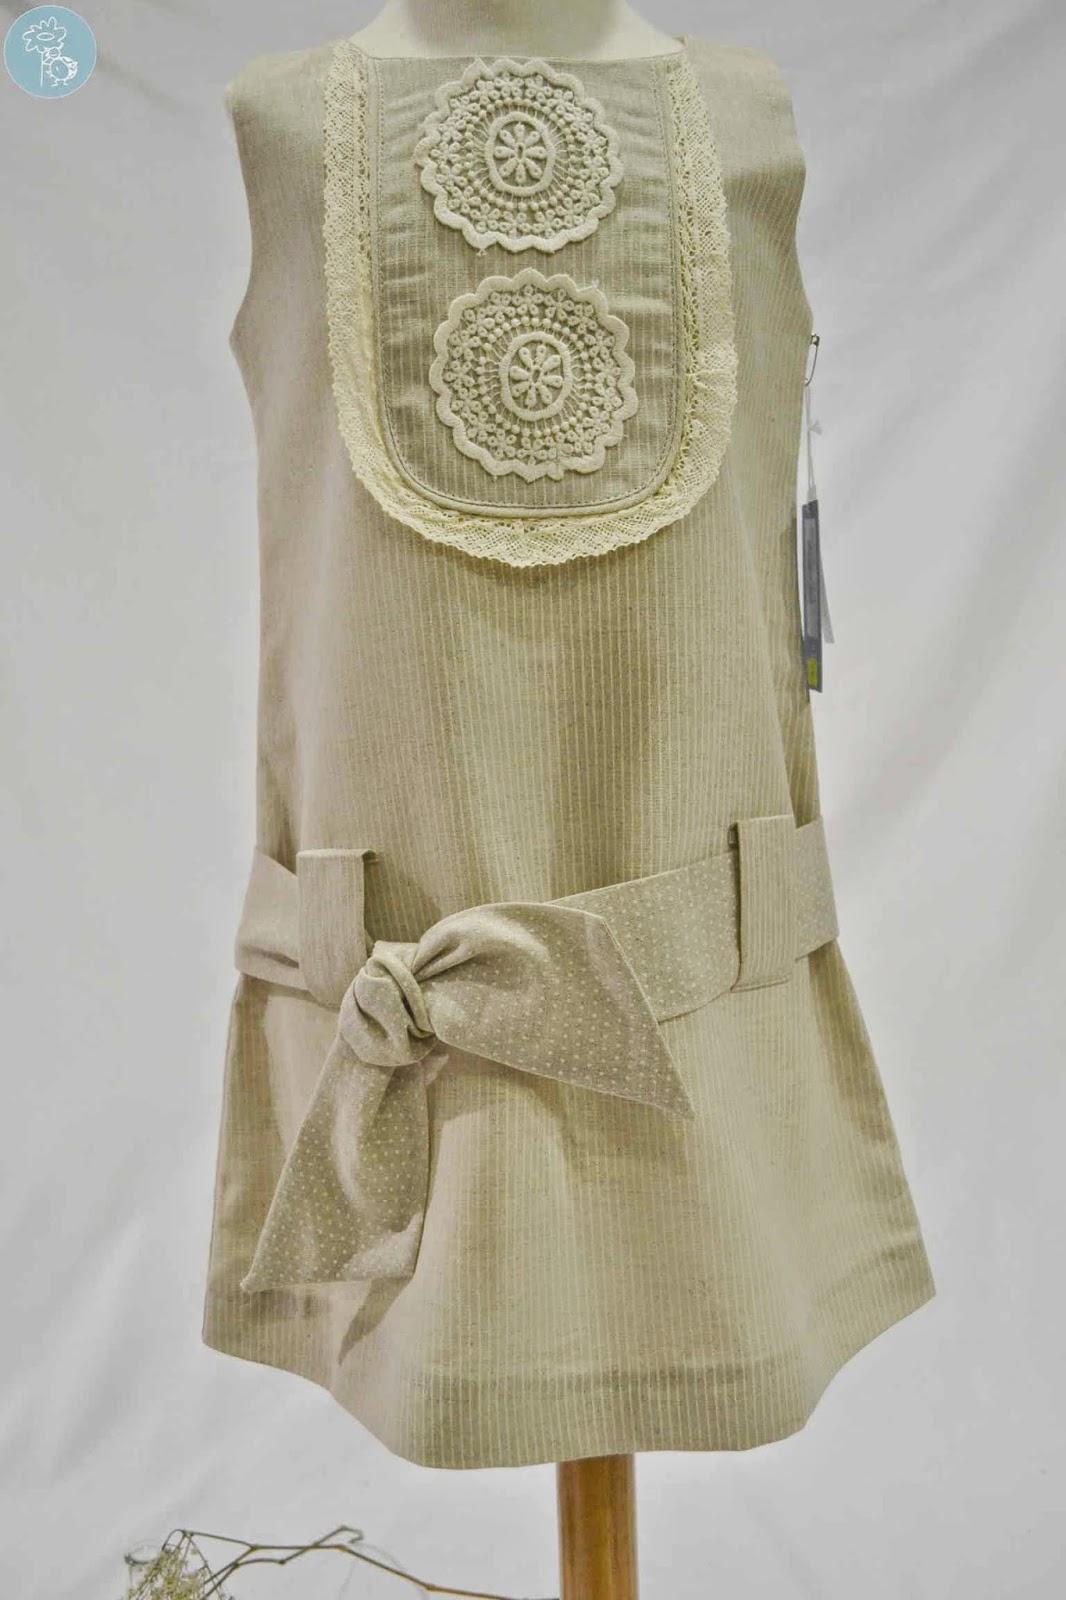 Vestido junior Babiné en Tienda -Blog- Retamalmodainfantil